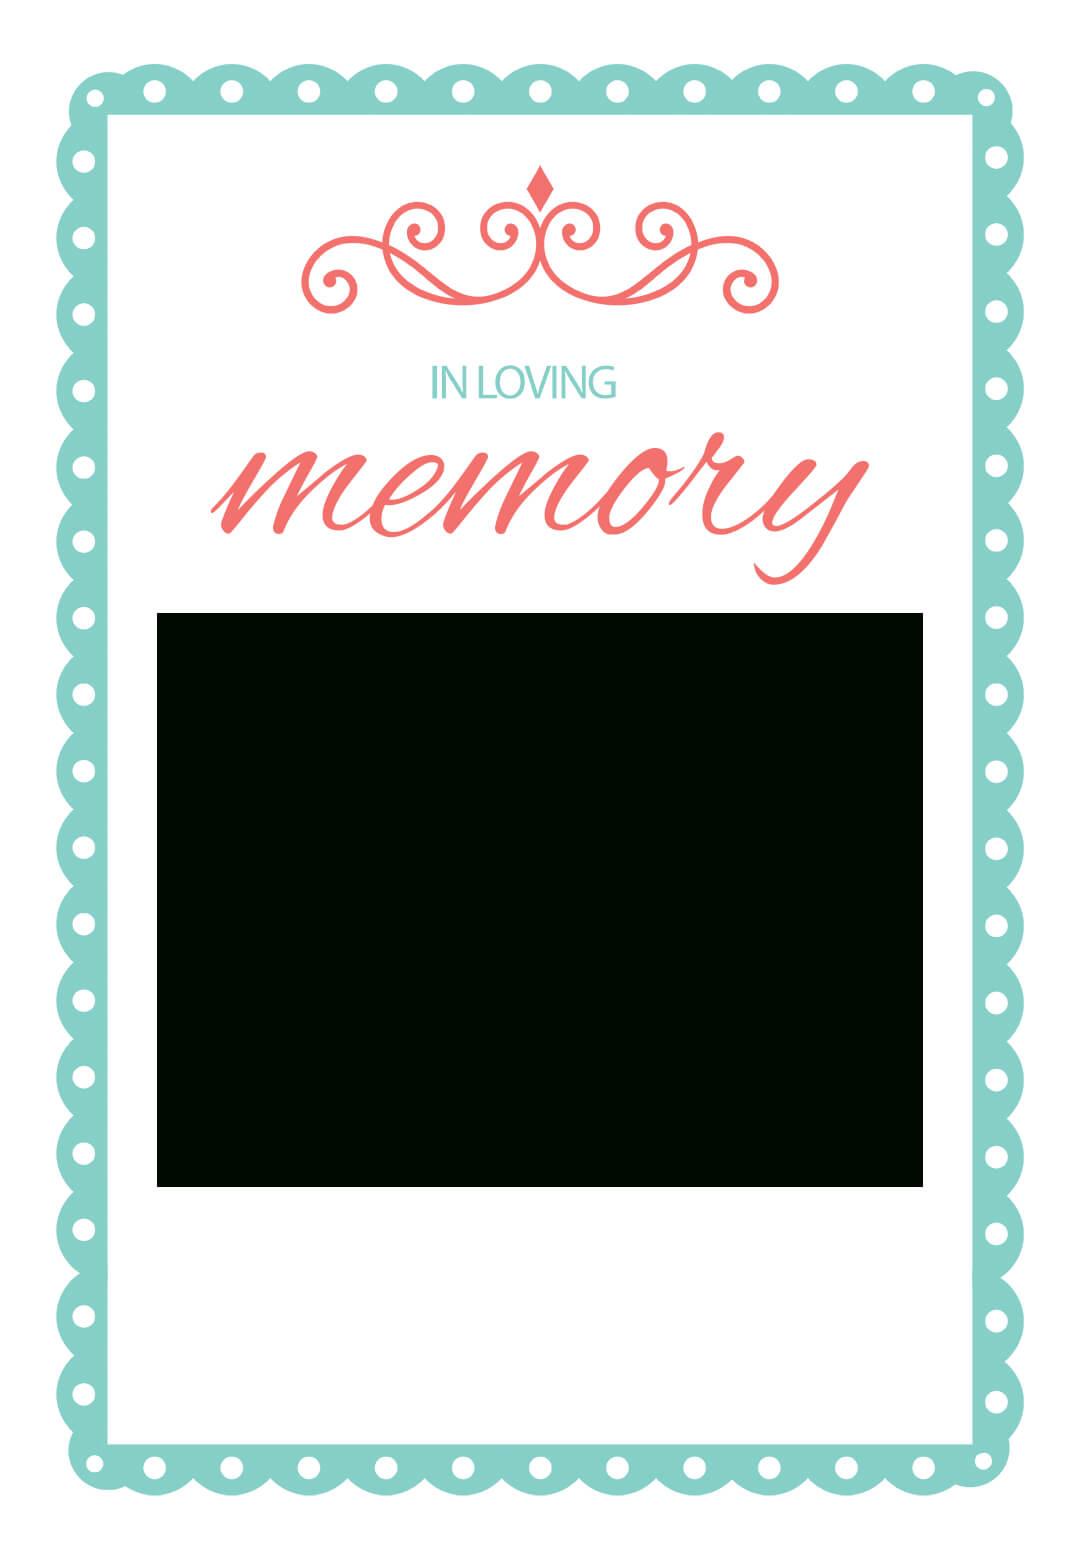 In Loving Memory - Free Memorial Card Template | Greetings Pertaining To In Memory Cards Templates